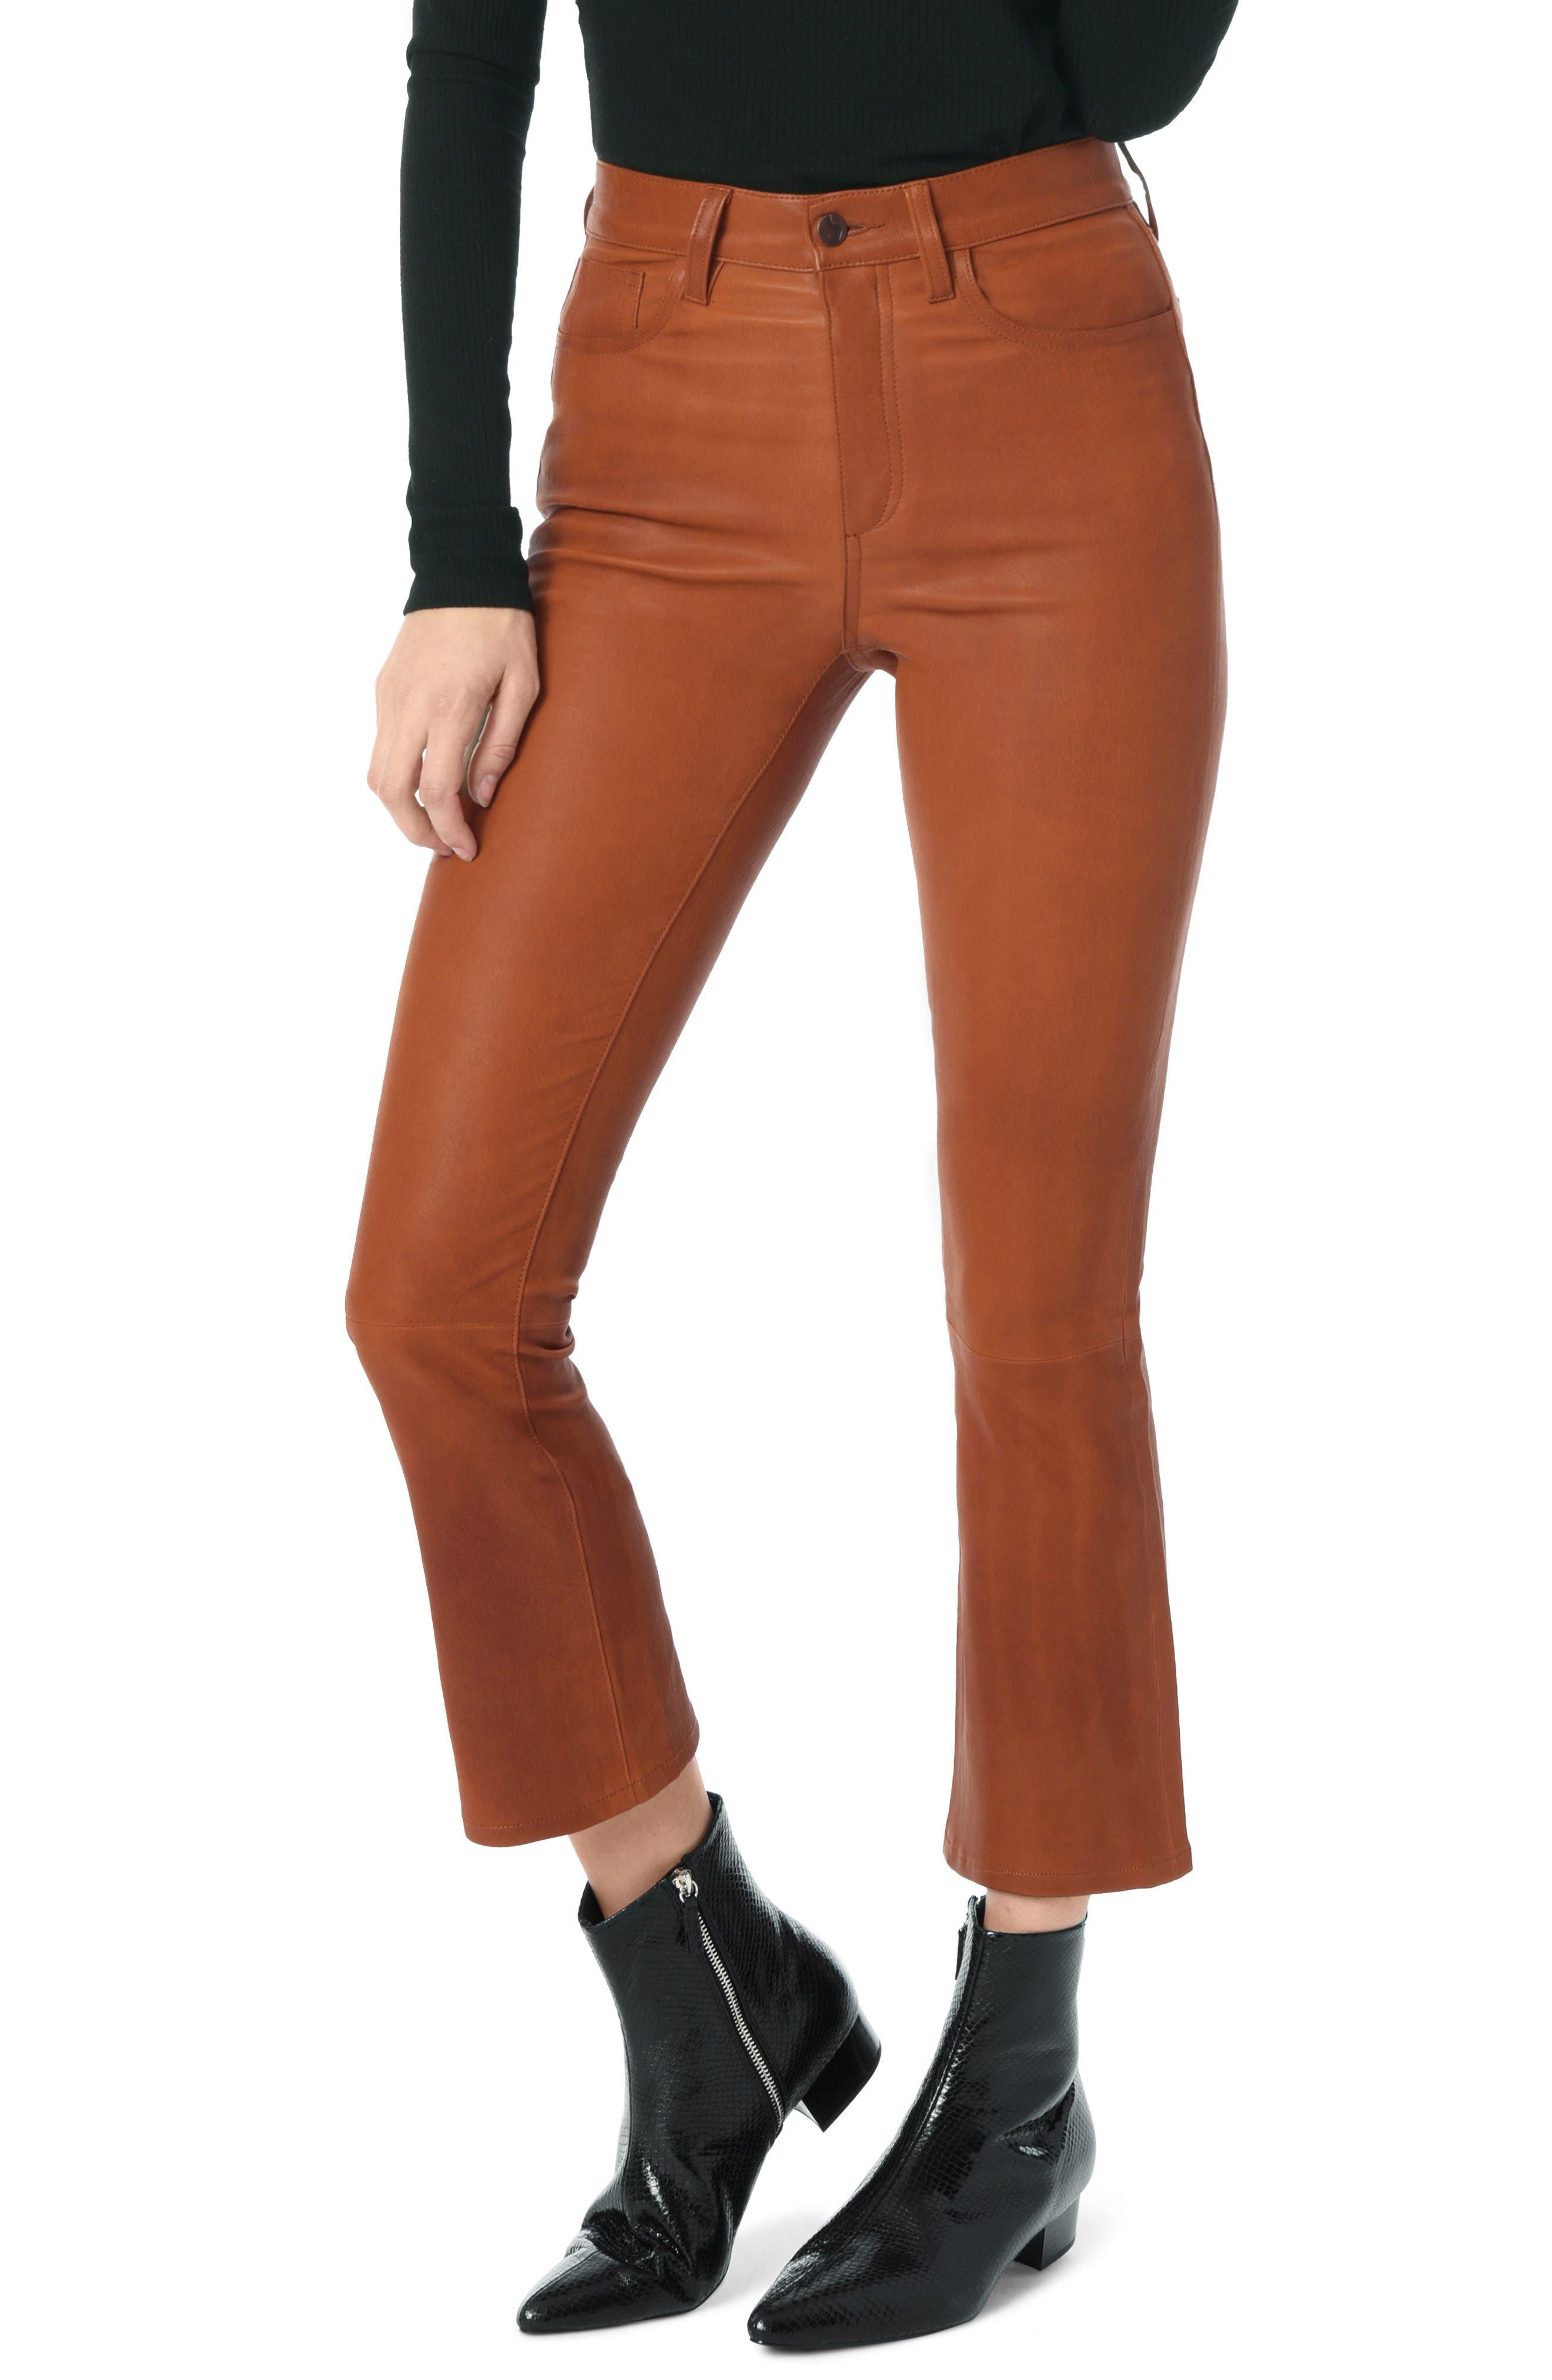 High Waist Crop Bootcut Leather Pants,                             Main thumbnail 1, color,                             COGNAC